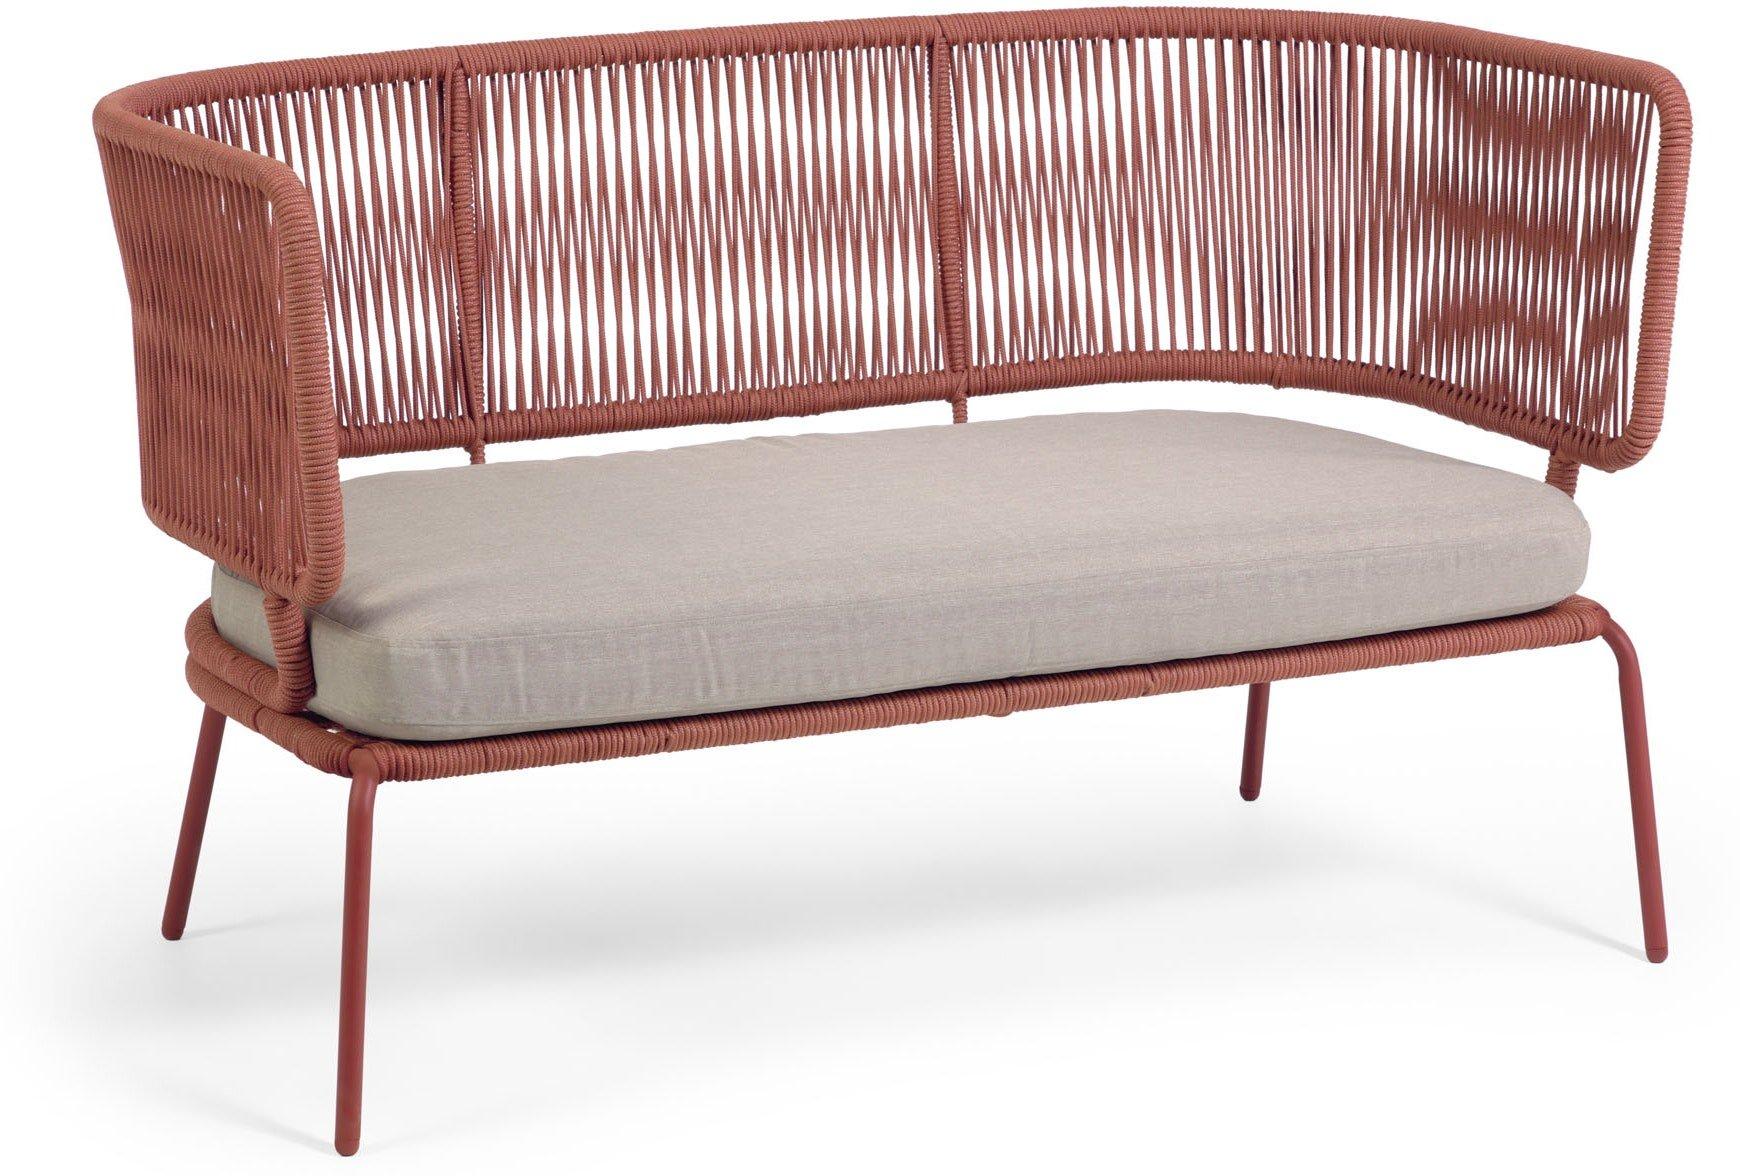 Nadin, Udendørs 2-personers sofa by LaForma (H: 80 cm. B: 135 cm. L: 65 cm., Lyserød)